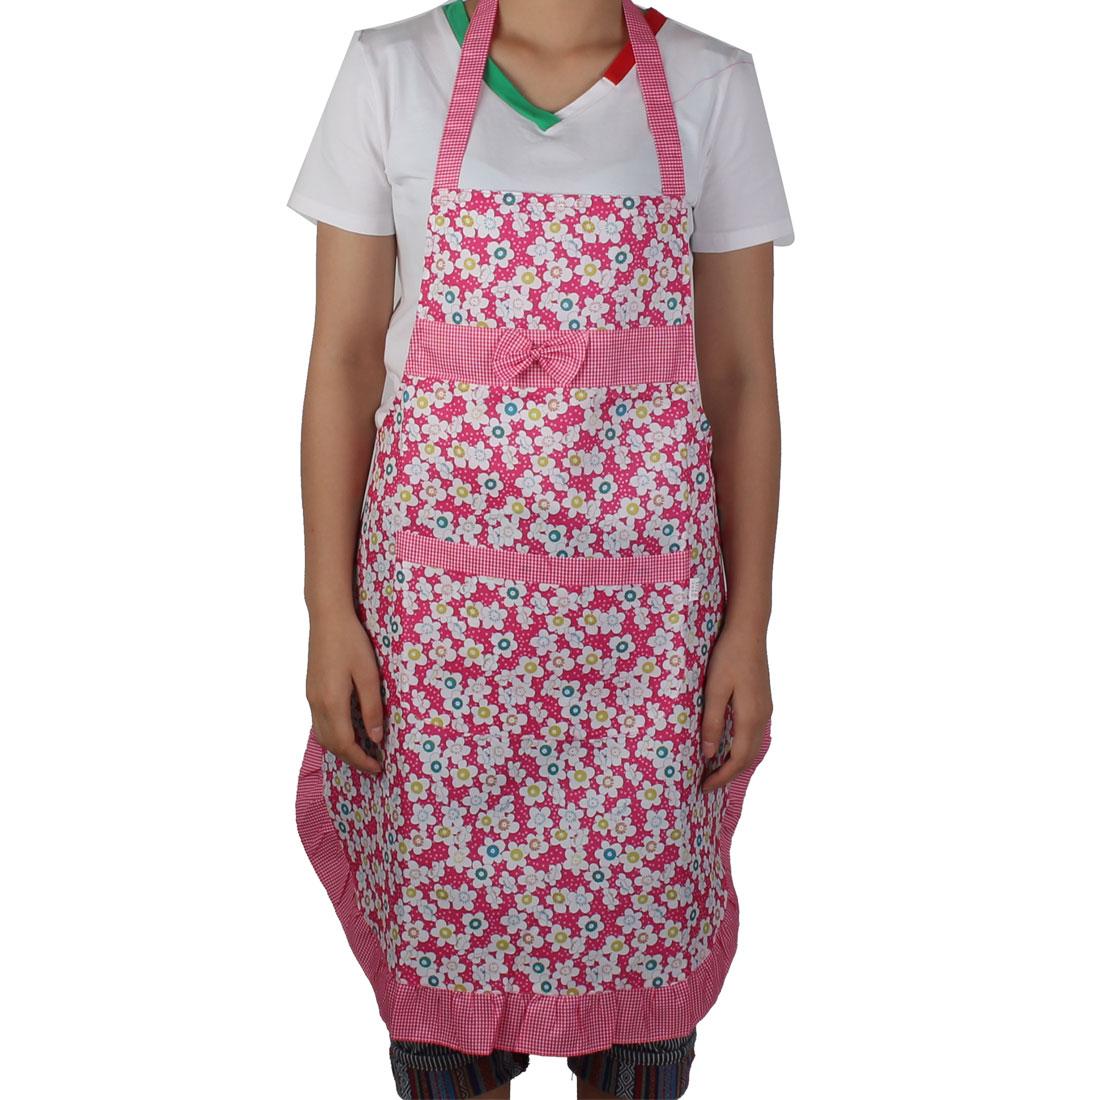 Chefs Household Restaurant Kitchen Working Flower Printed Bowknot Design Apron Bib Pocket Dress Multicolor